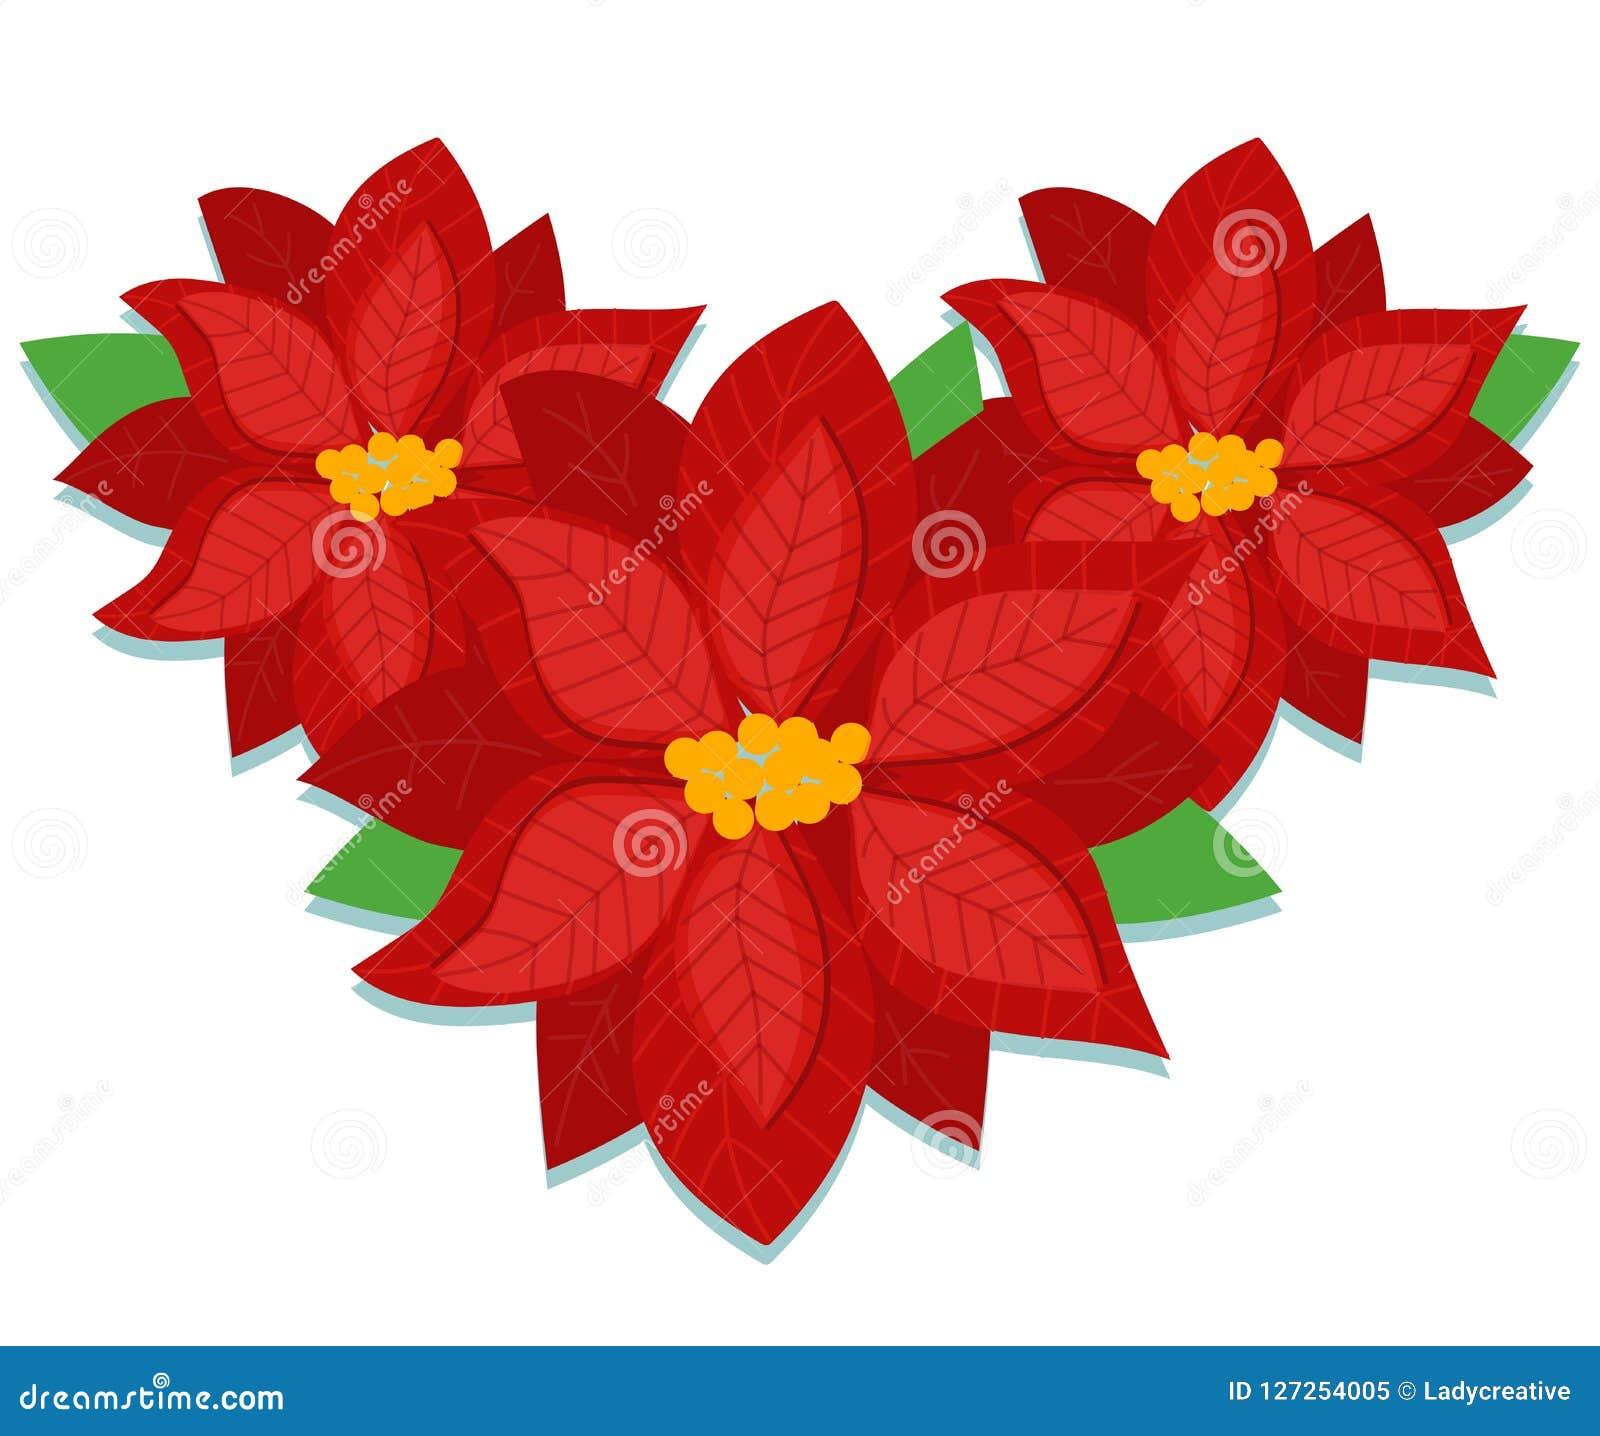 Poinsettia Christmas Flower Vector Stock Vector Illustration Of Christmas Decoration 127254005